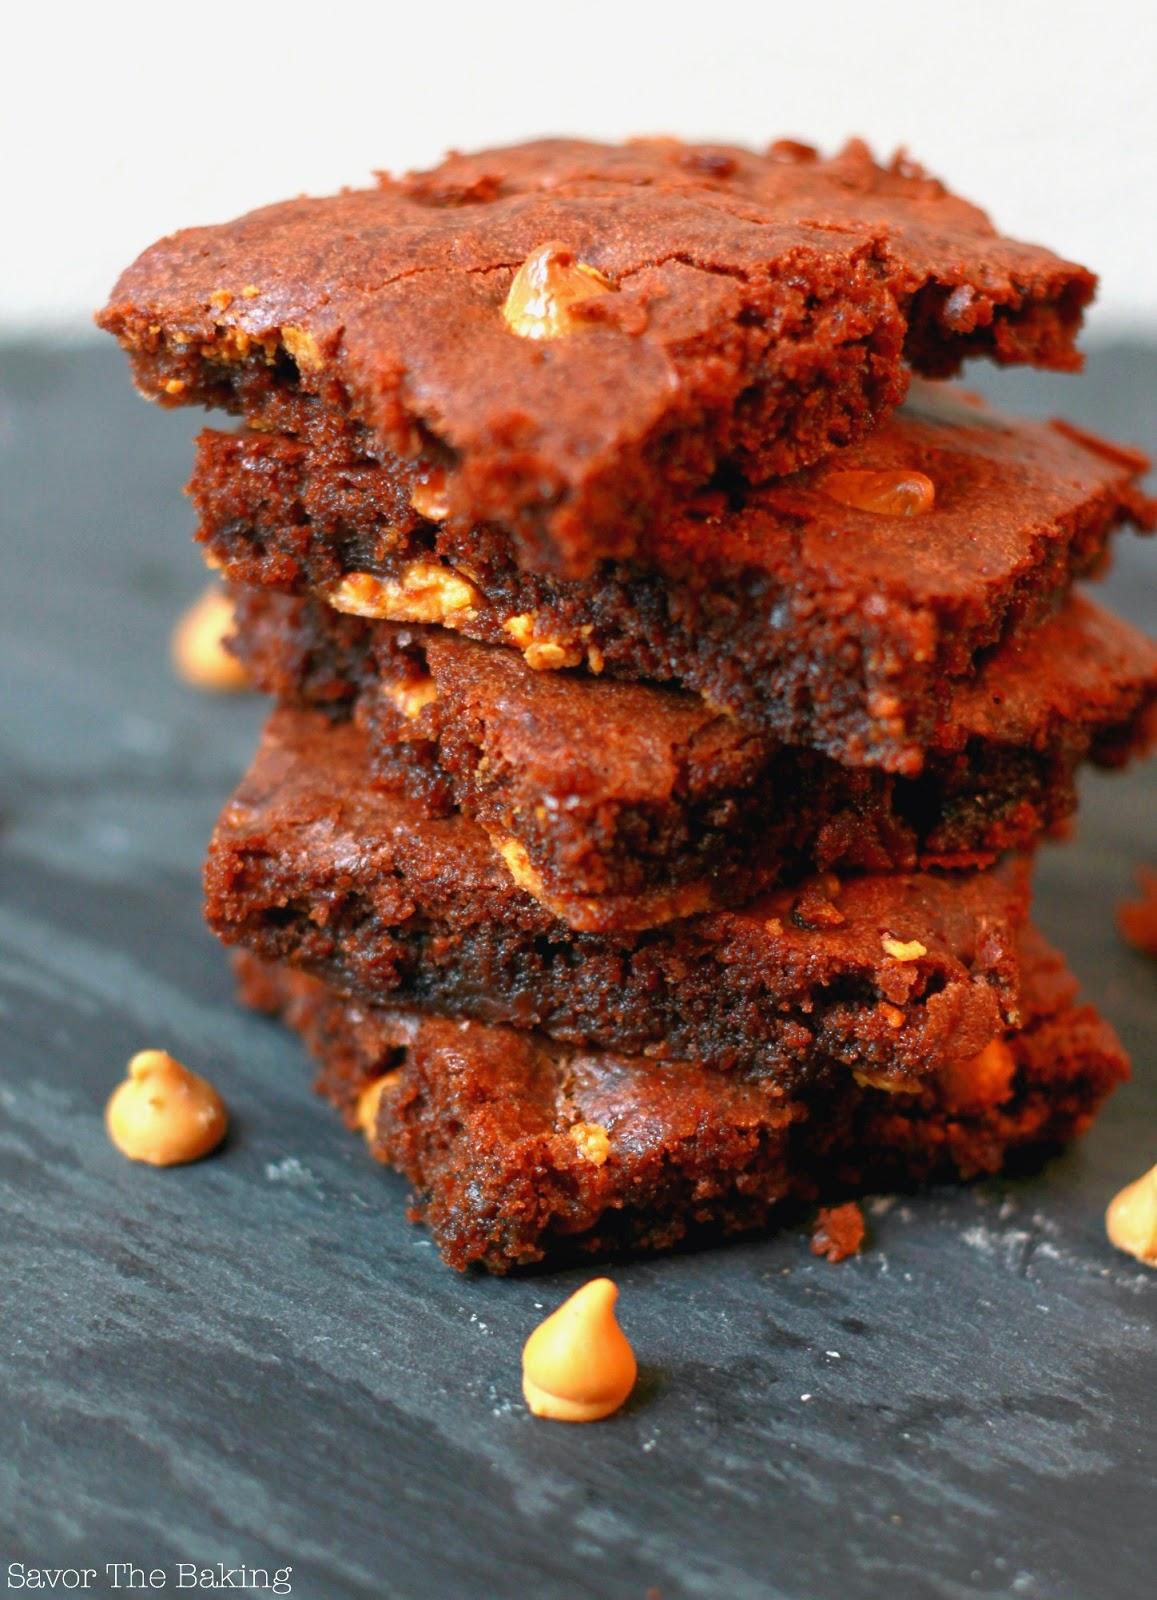 Easy Healthy Vegan Dessert   Homemade Recipes http://homemaderecipes.com/holiday-event/national-butterscotch-brownie-day